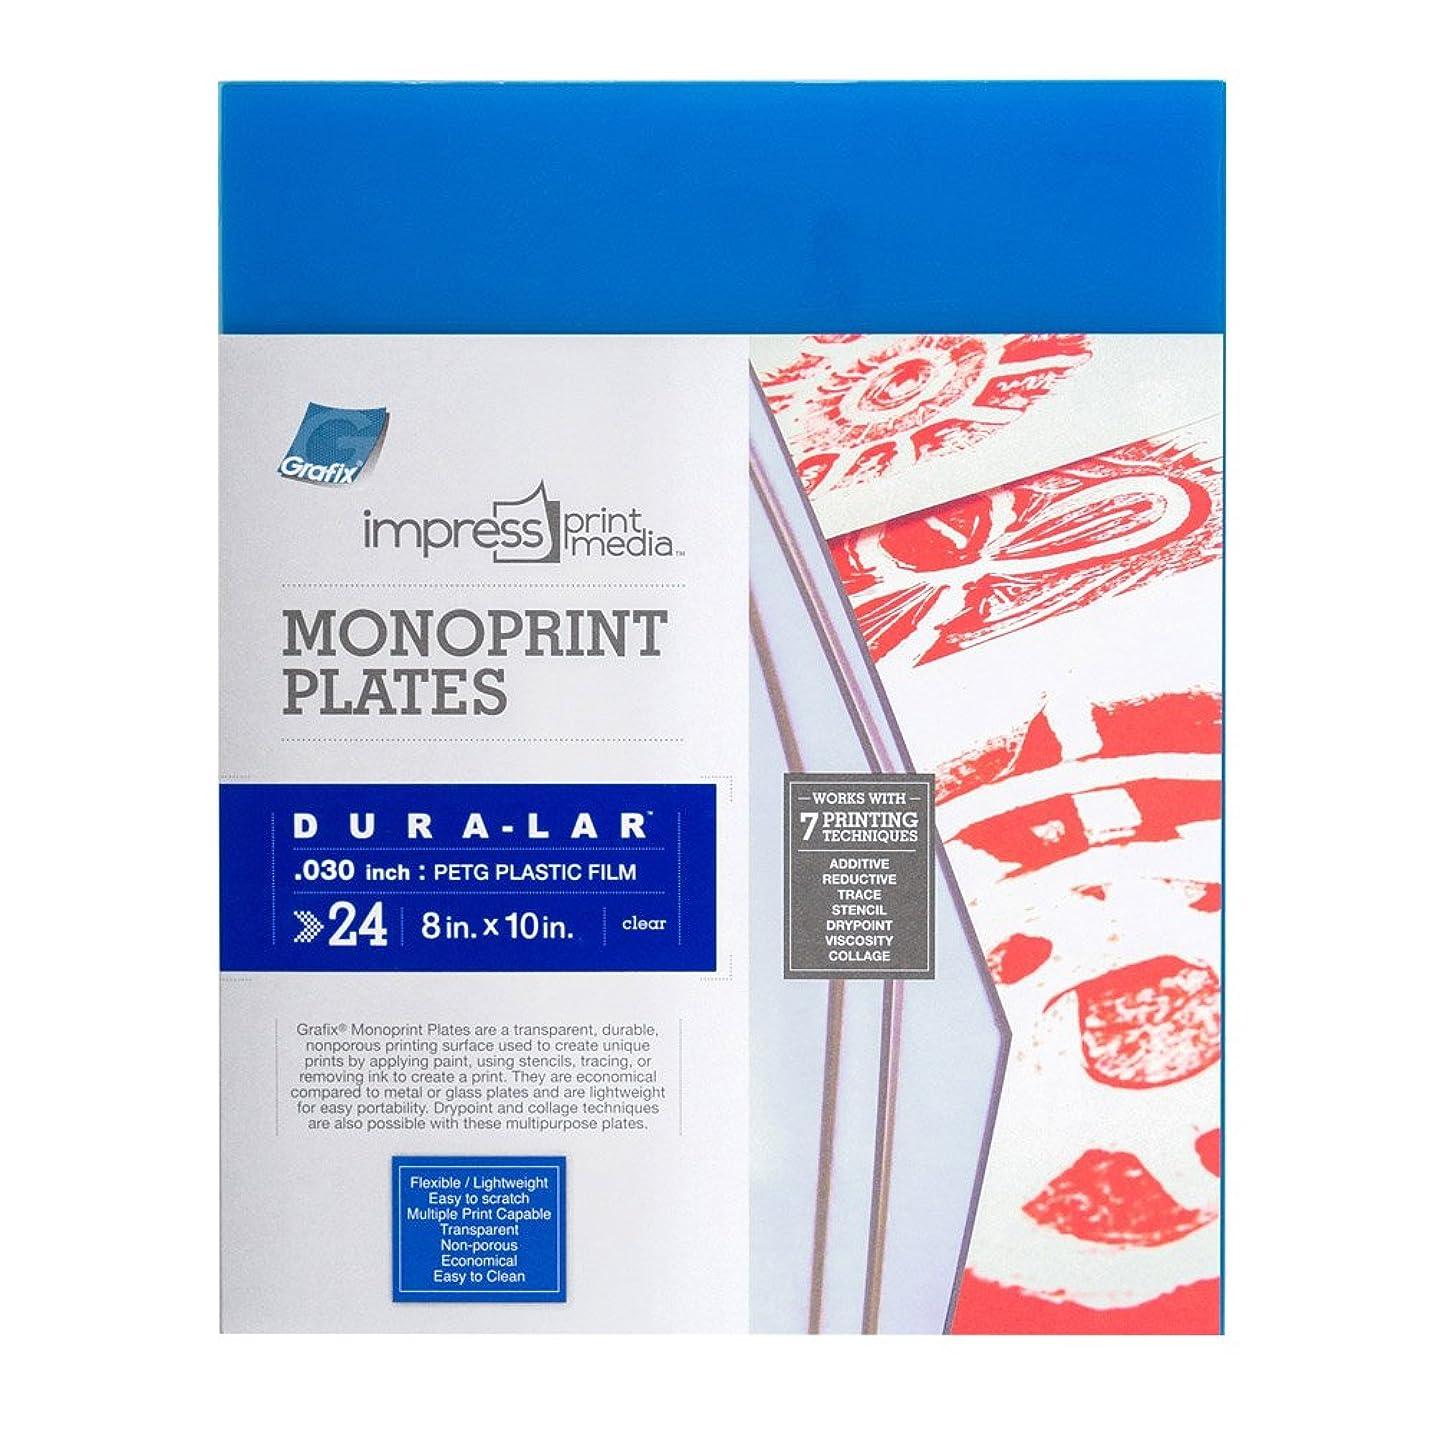 Grafix Impress Print Media Monoprint Plates (24 Pack), 8